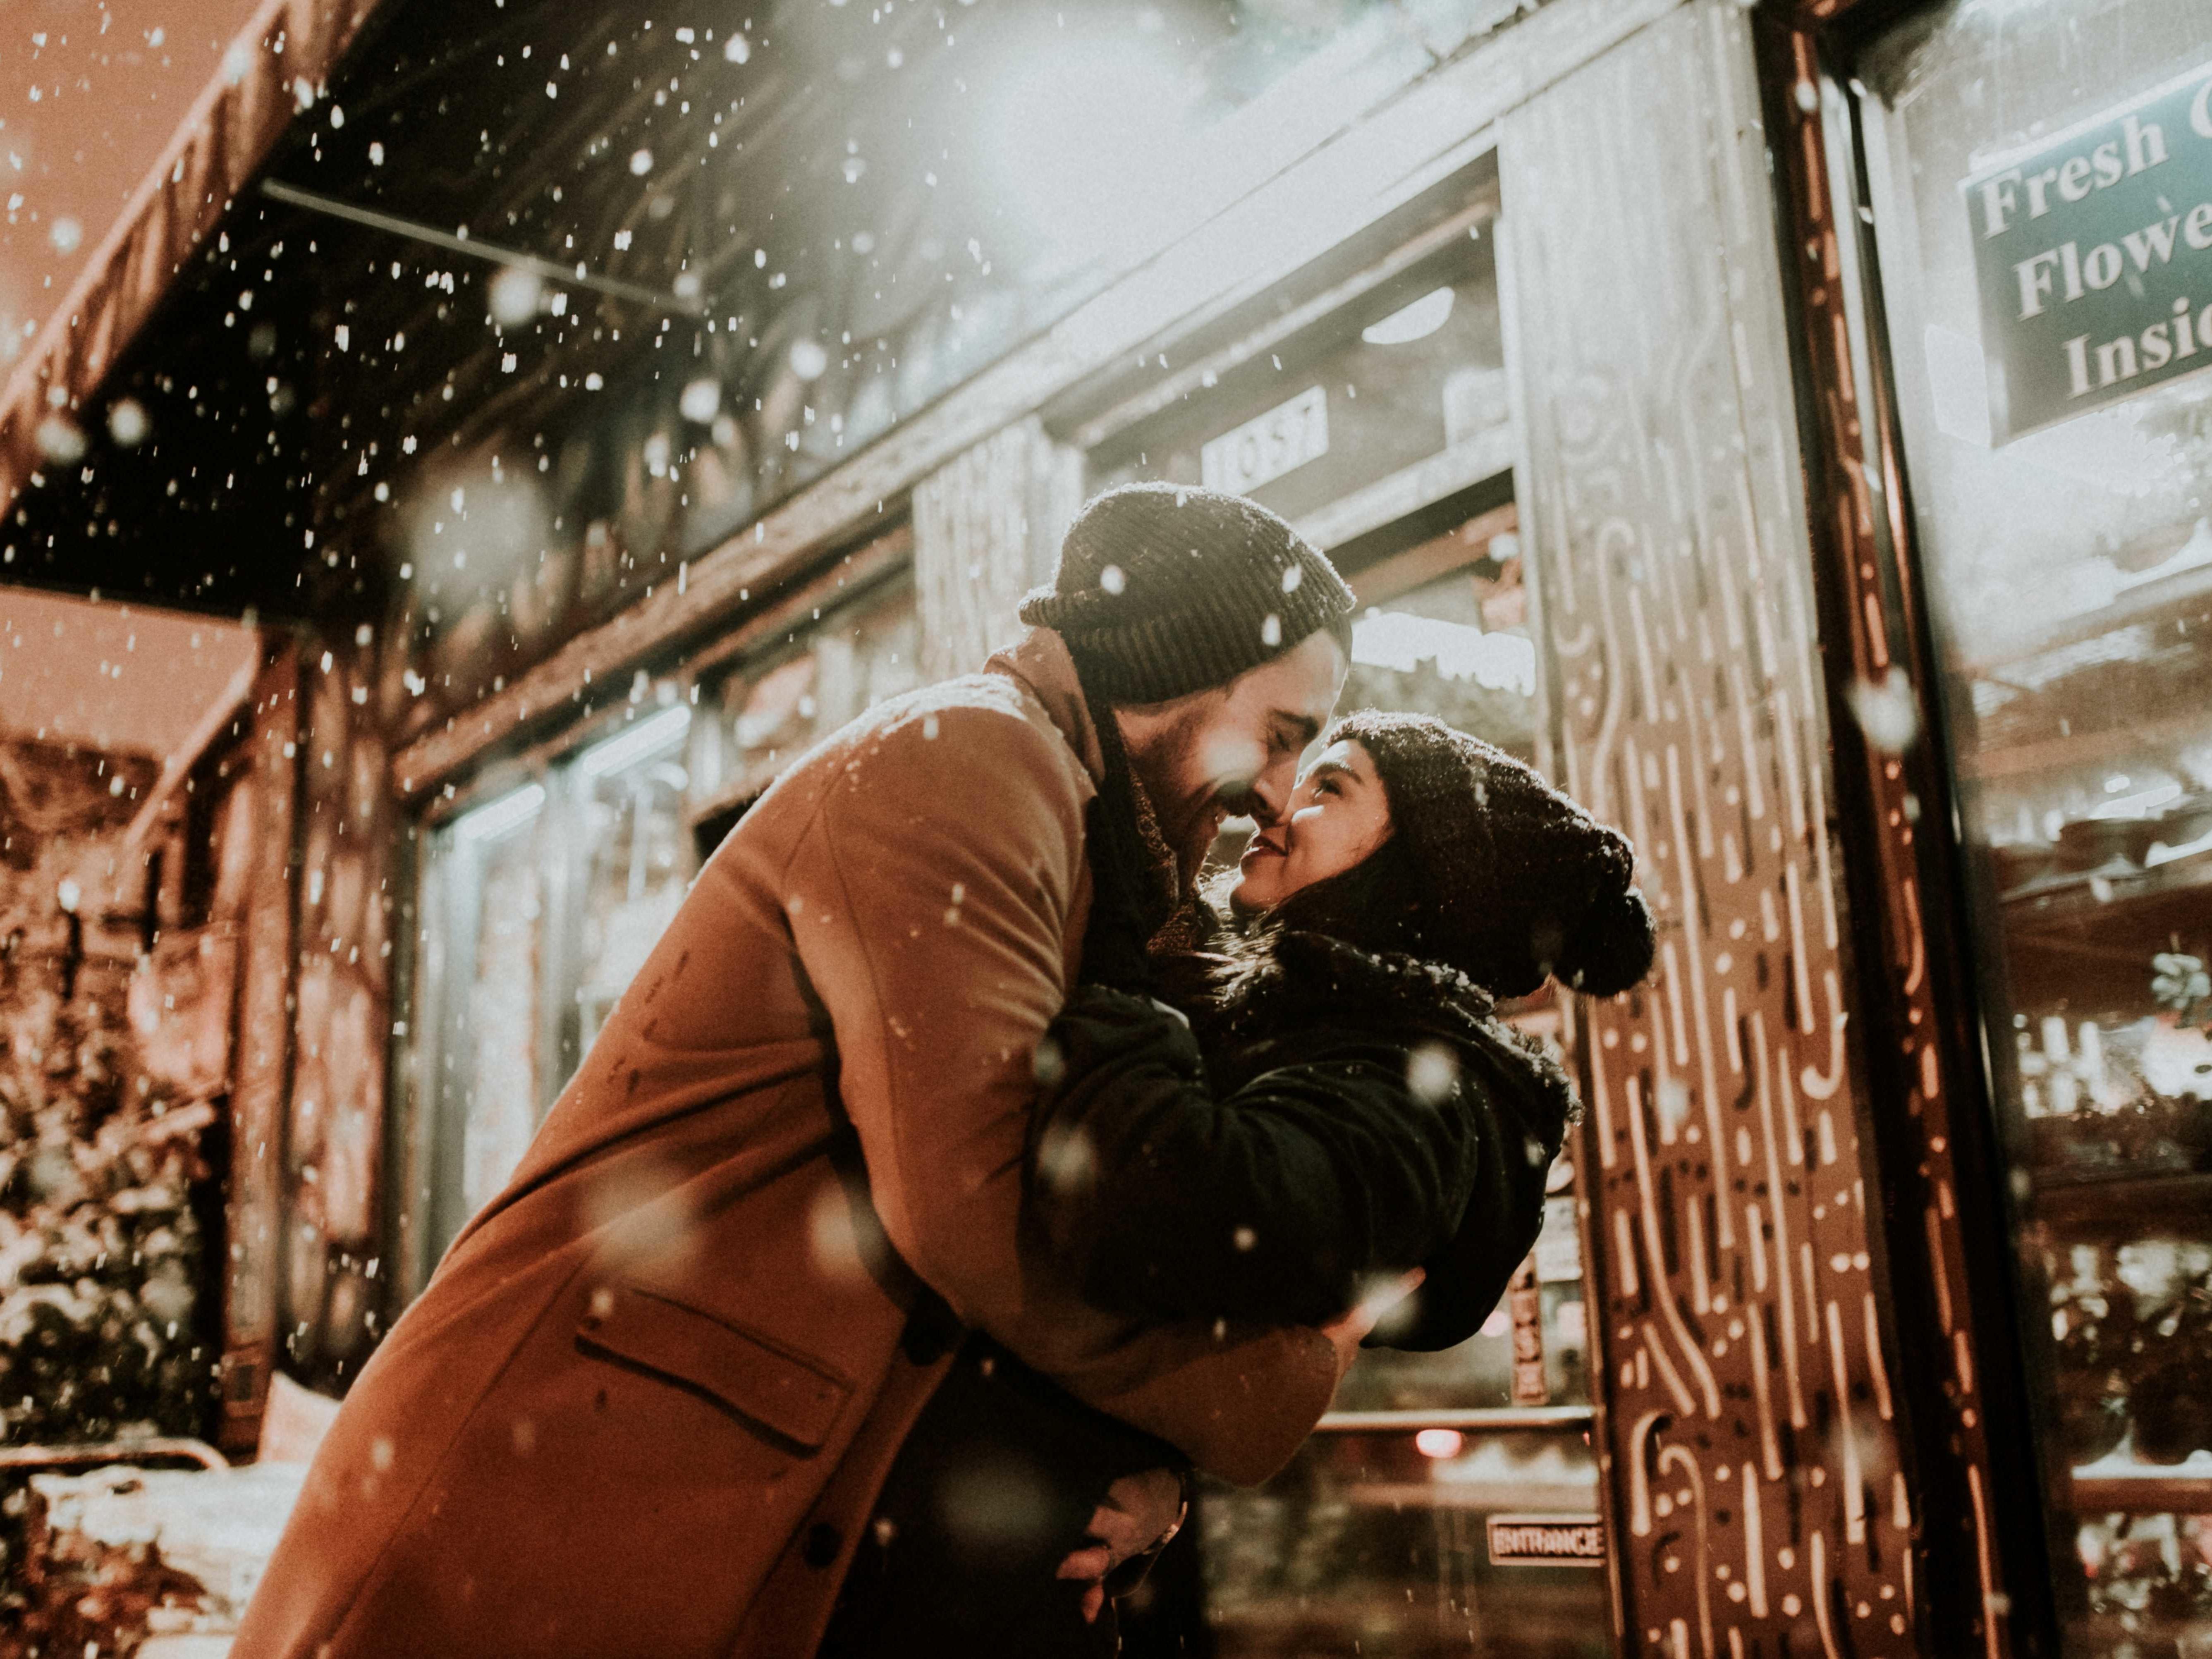 couple-kissing-snowy-night